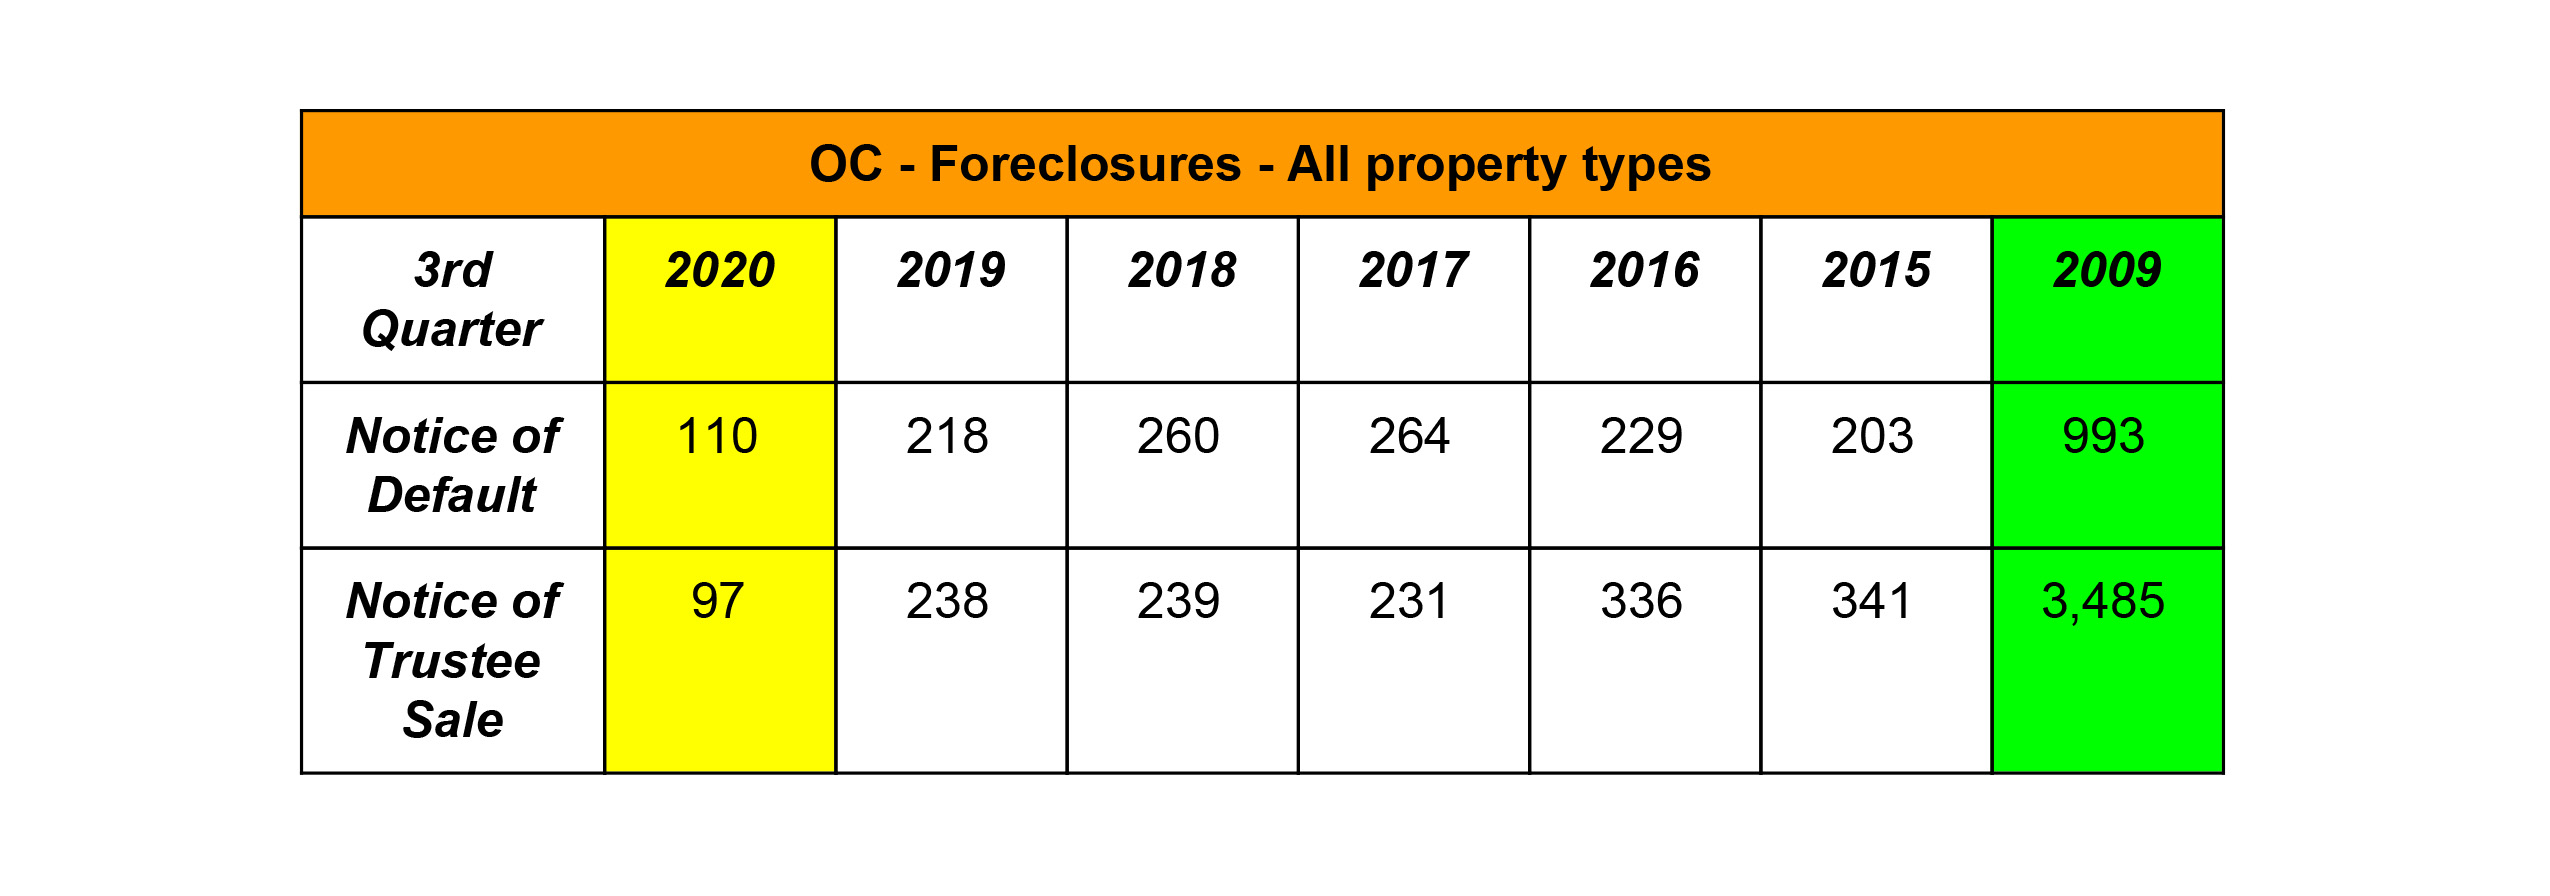 OC Market Real Estate Update Foreclosures